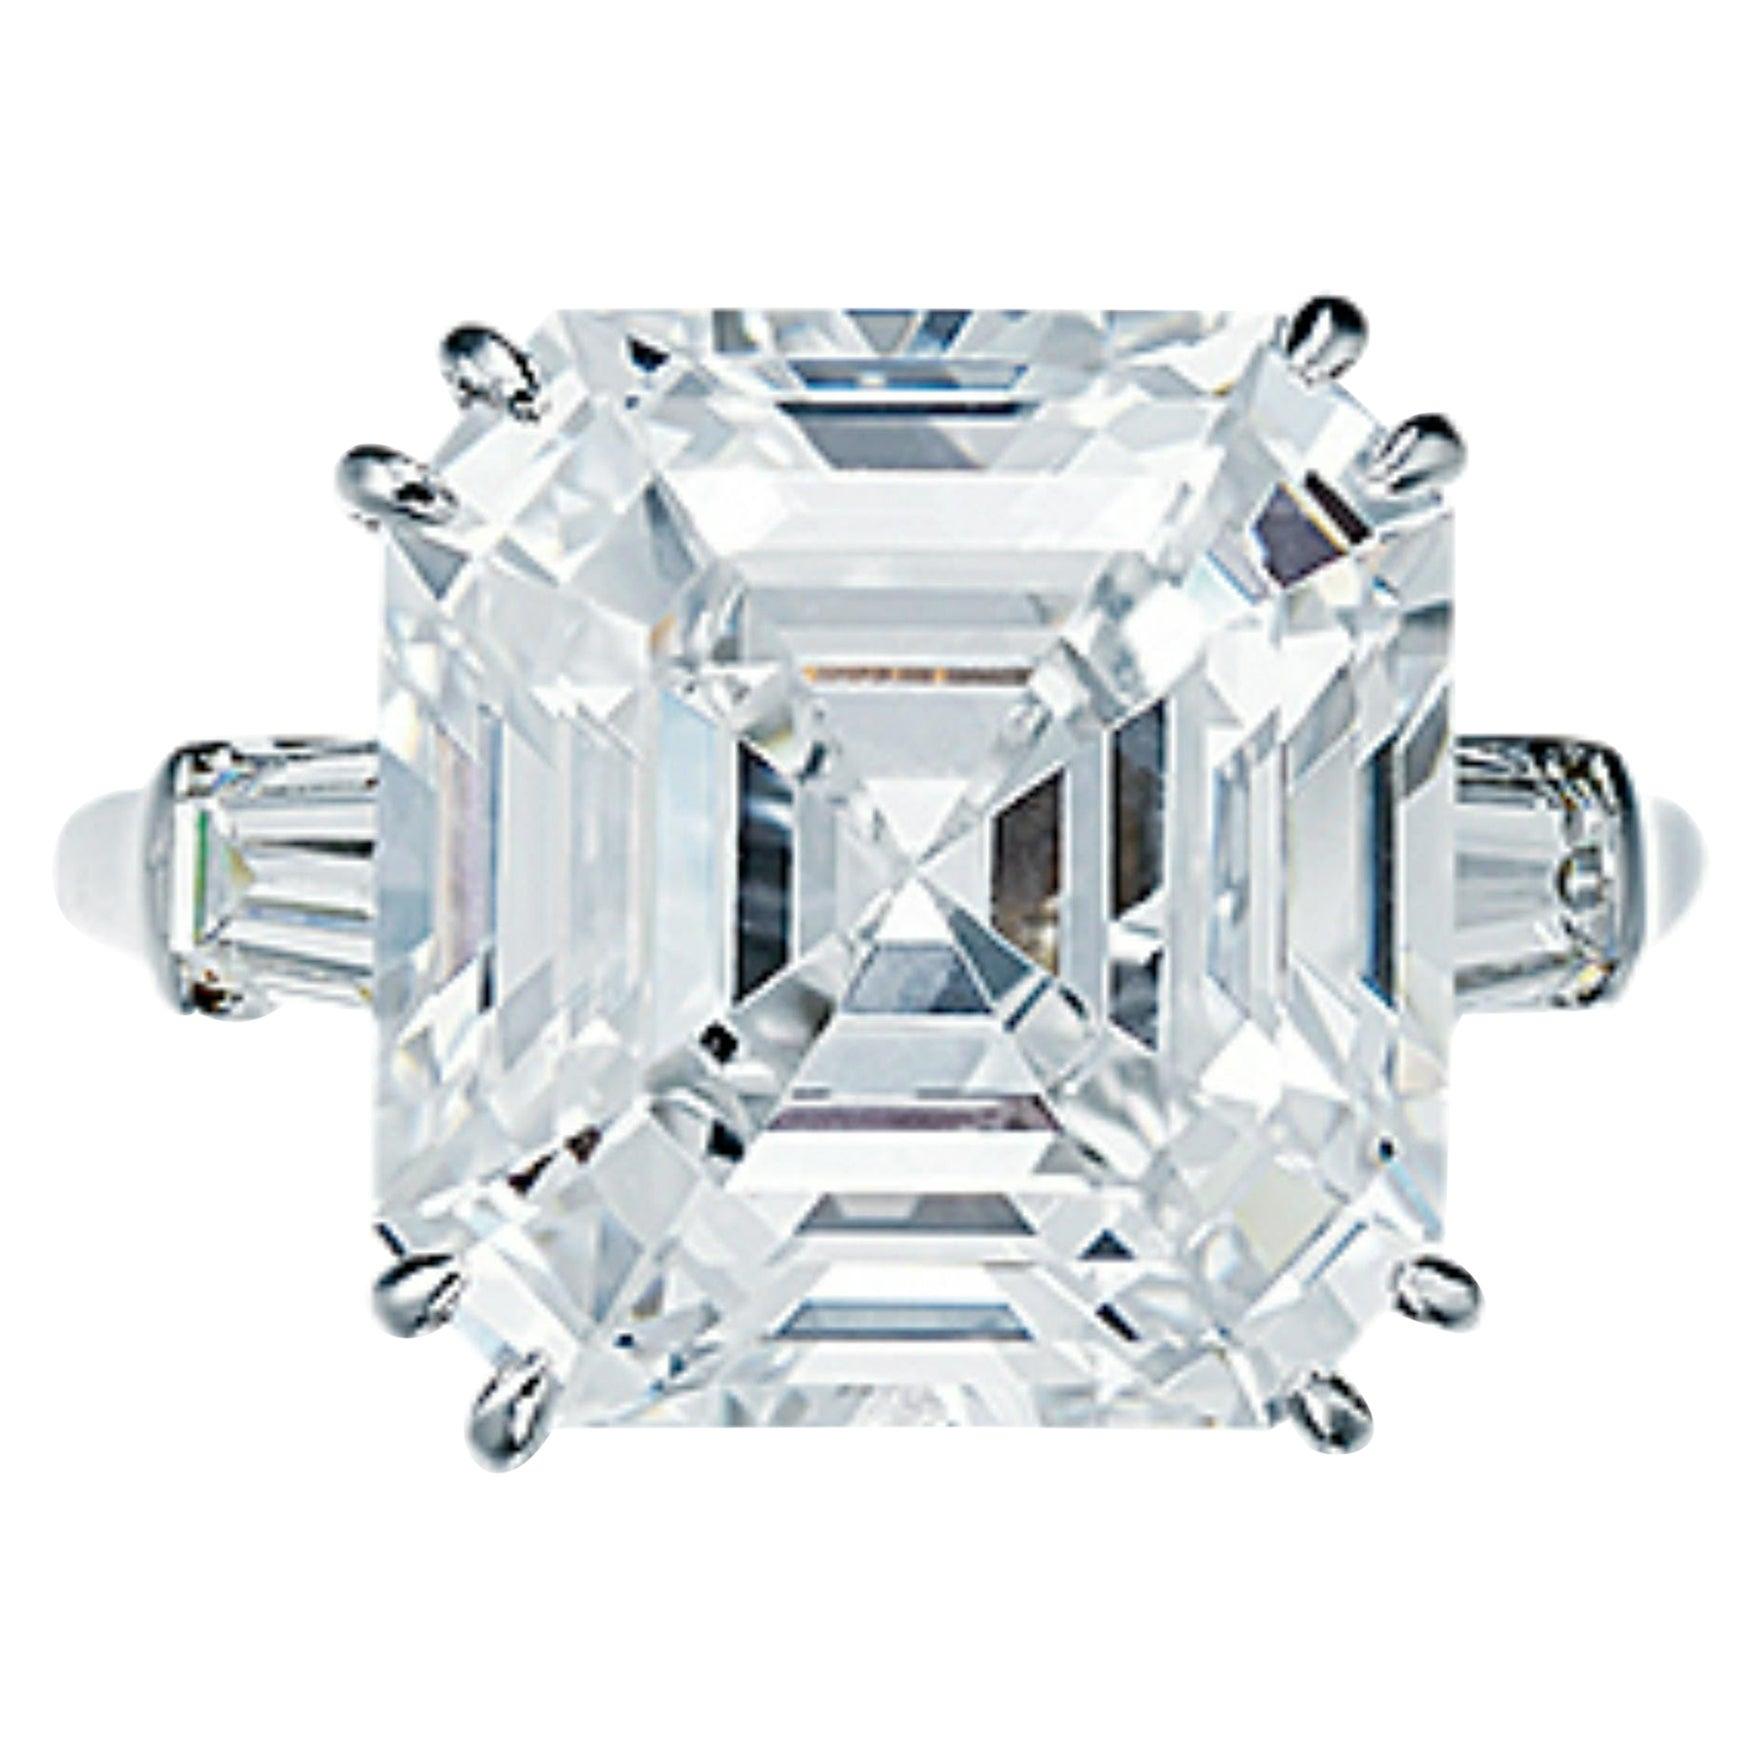 GIA Certified 3.40 Carat Asscher Cut D Color Diamond Solitaire Ring